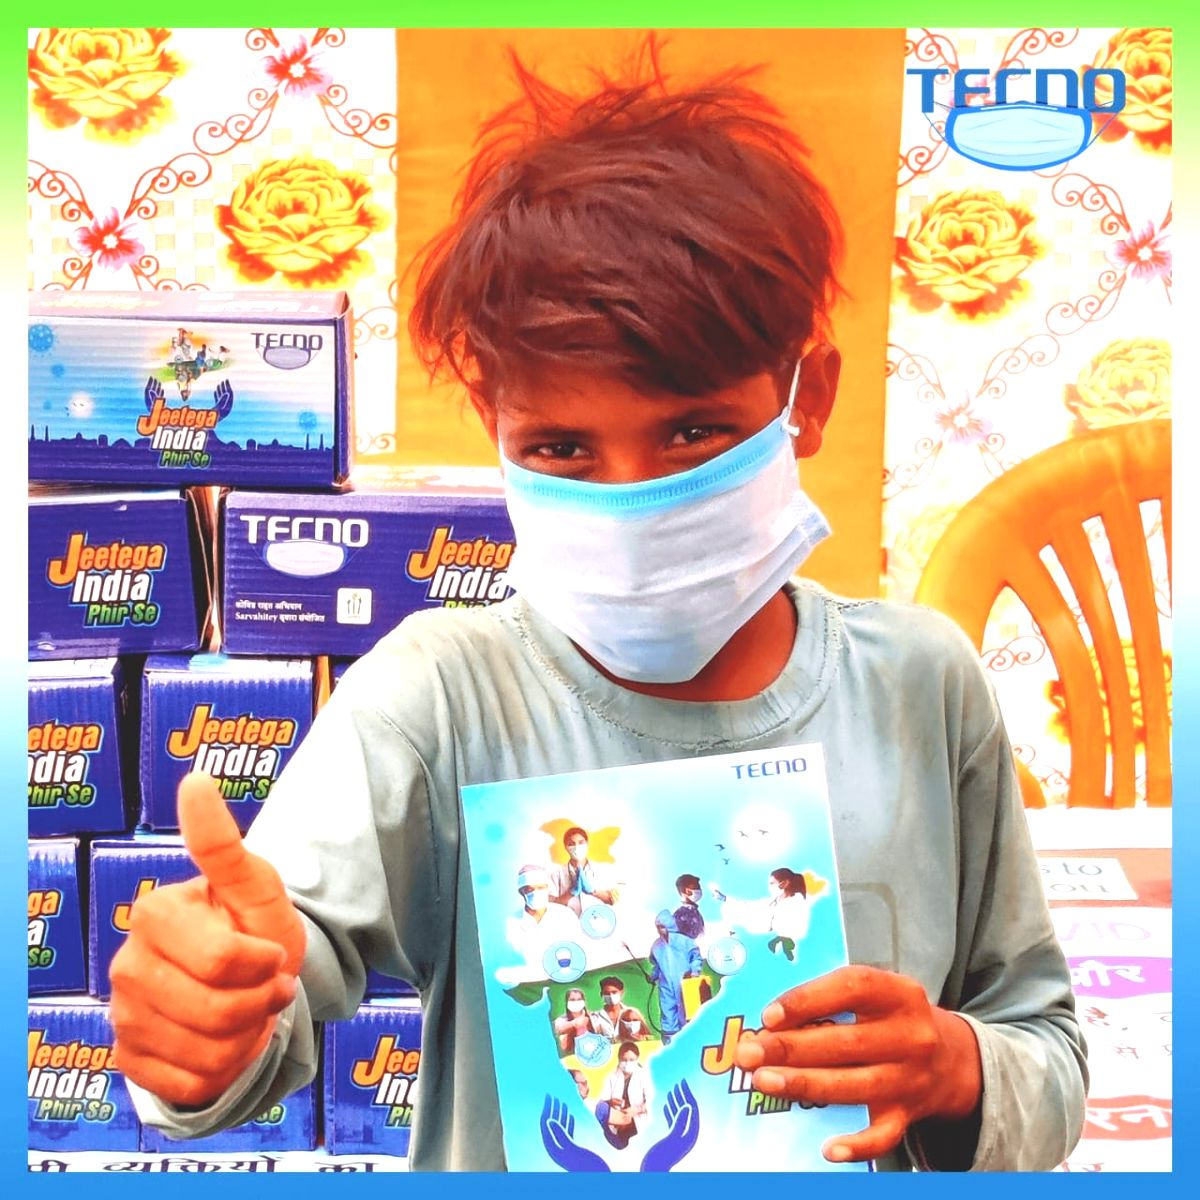 TECNO launches Jeetega India Phirse social initiative to fight against Covid